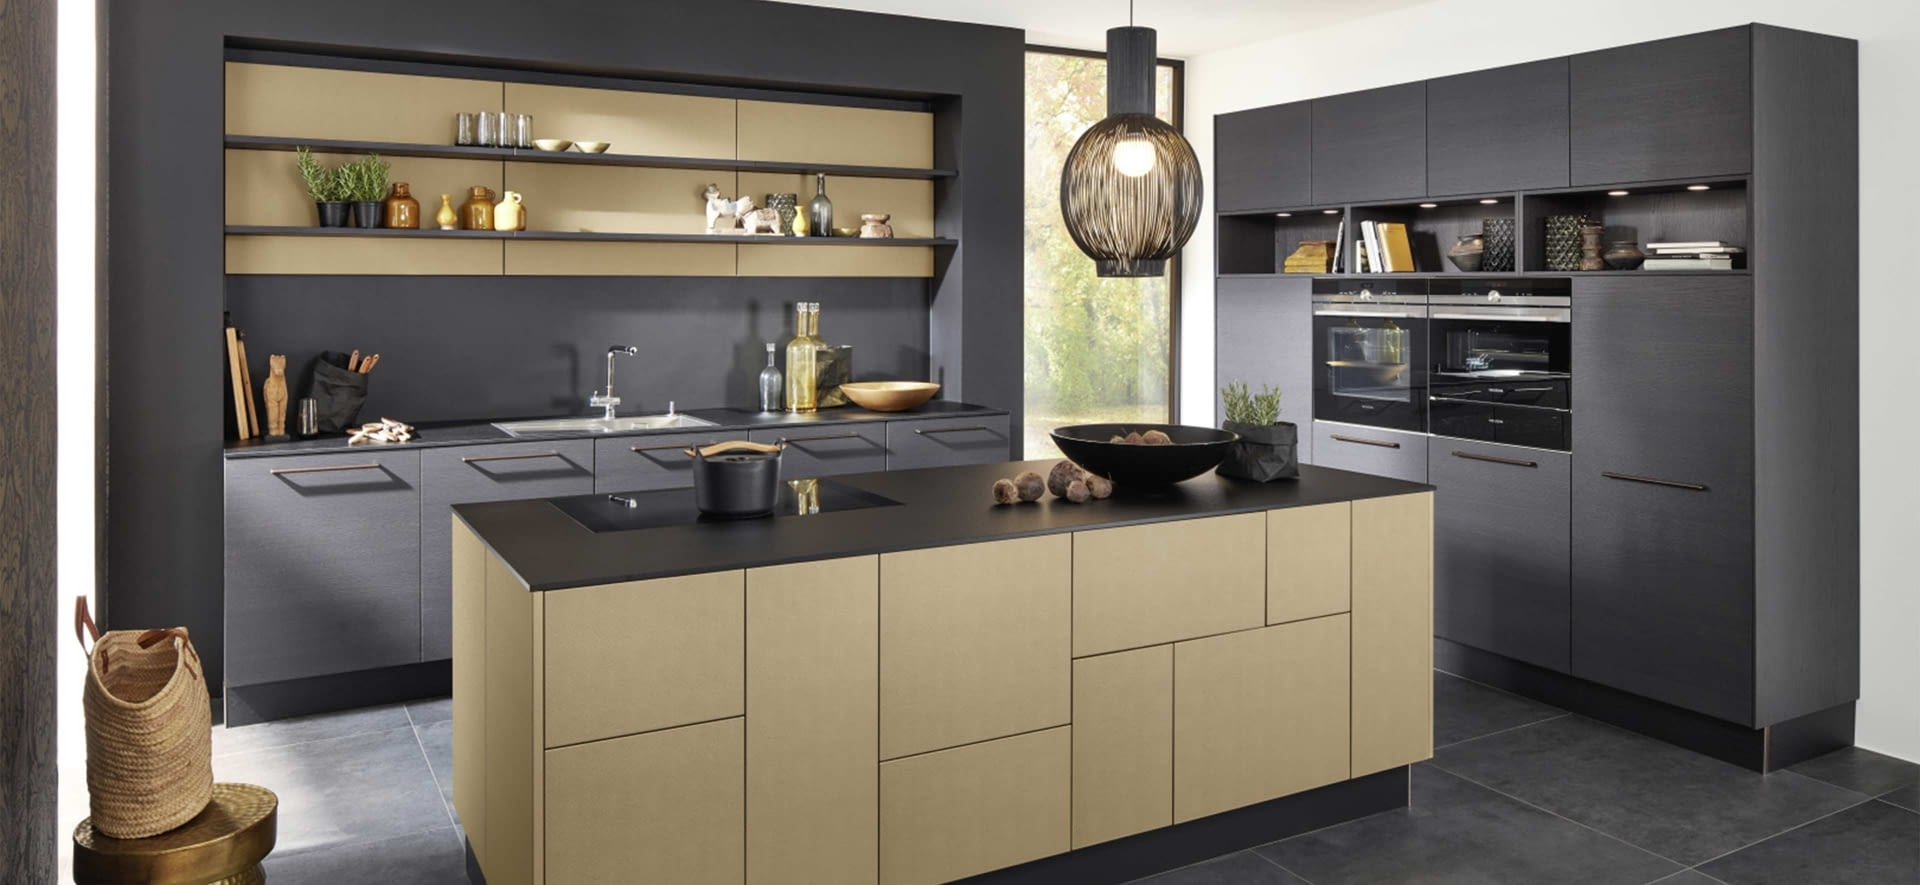 designk che mit lederoptik inkagold front und terra molino marquardt k chen. Black Bedroom Furniture Sets. Home Design Ideas